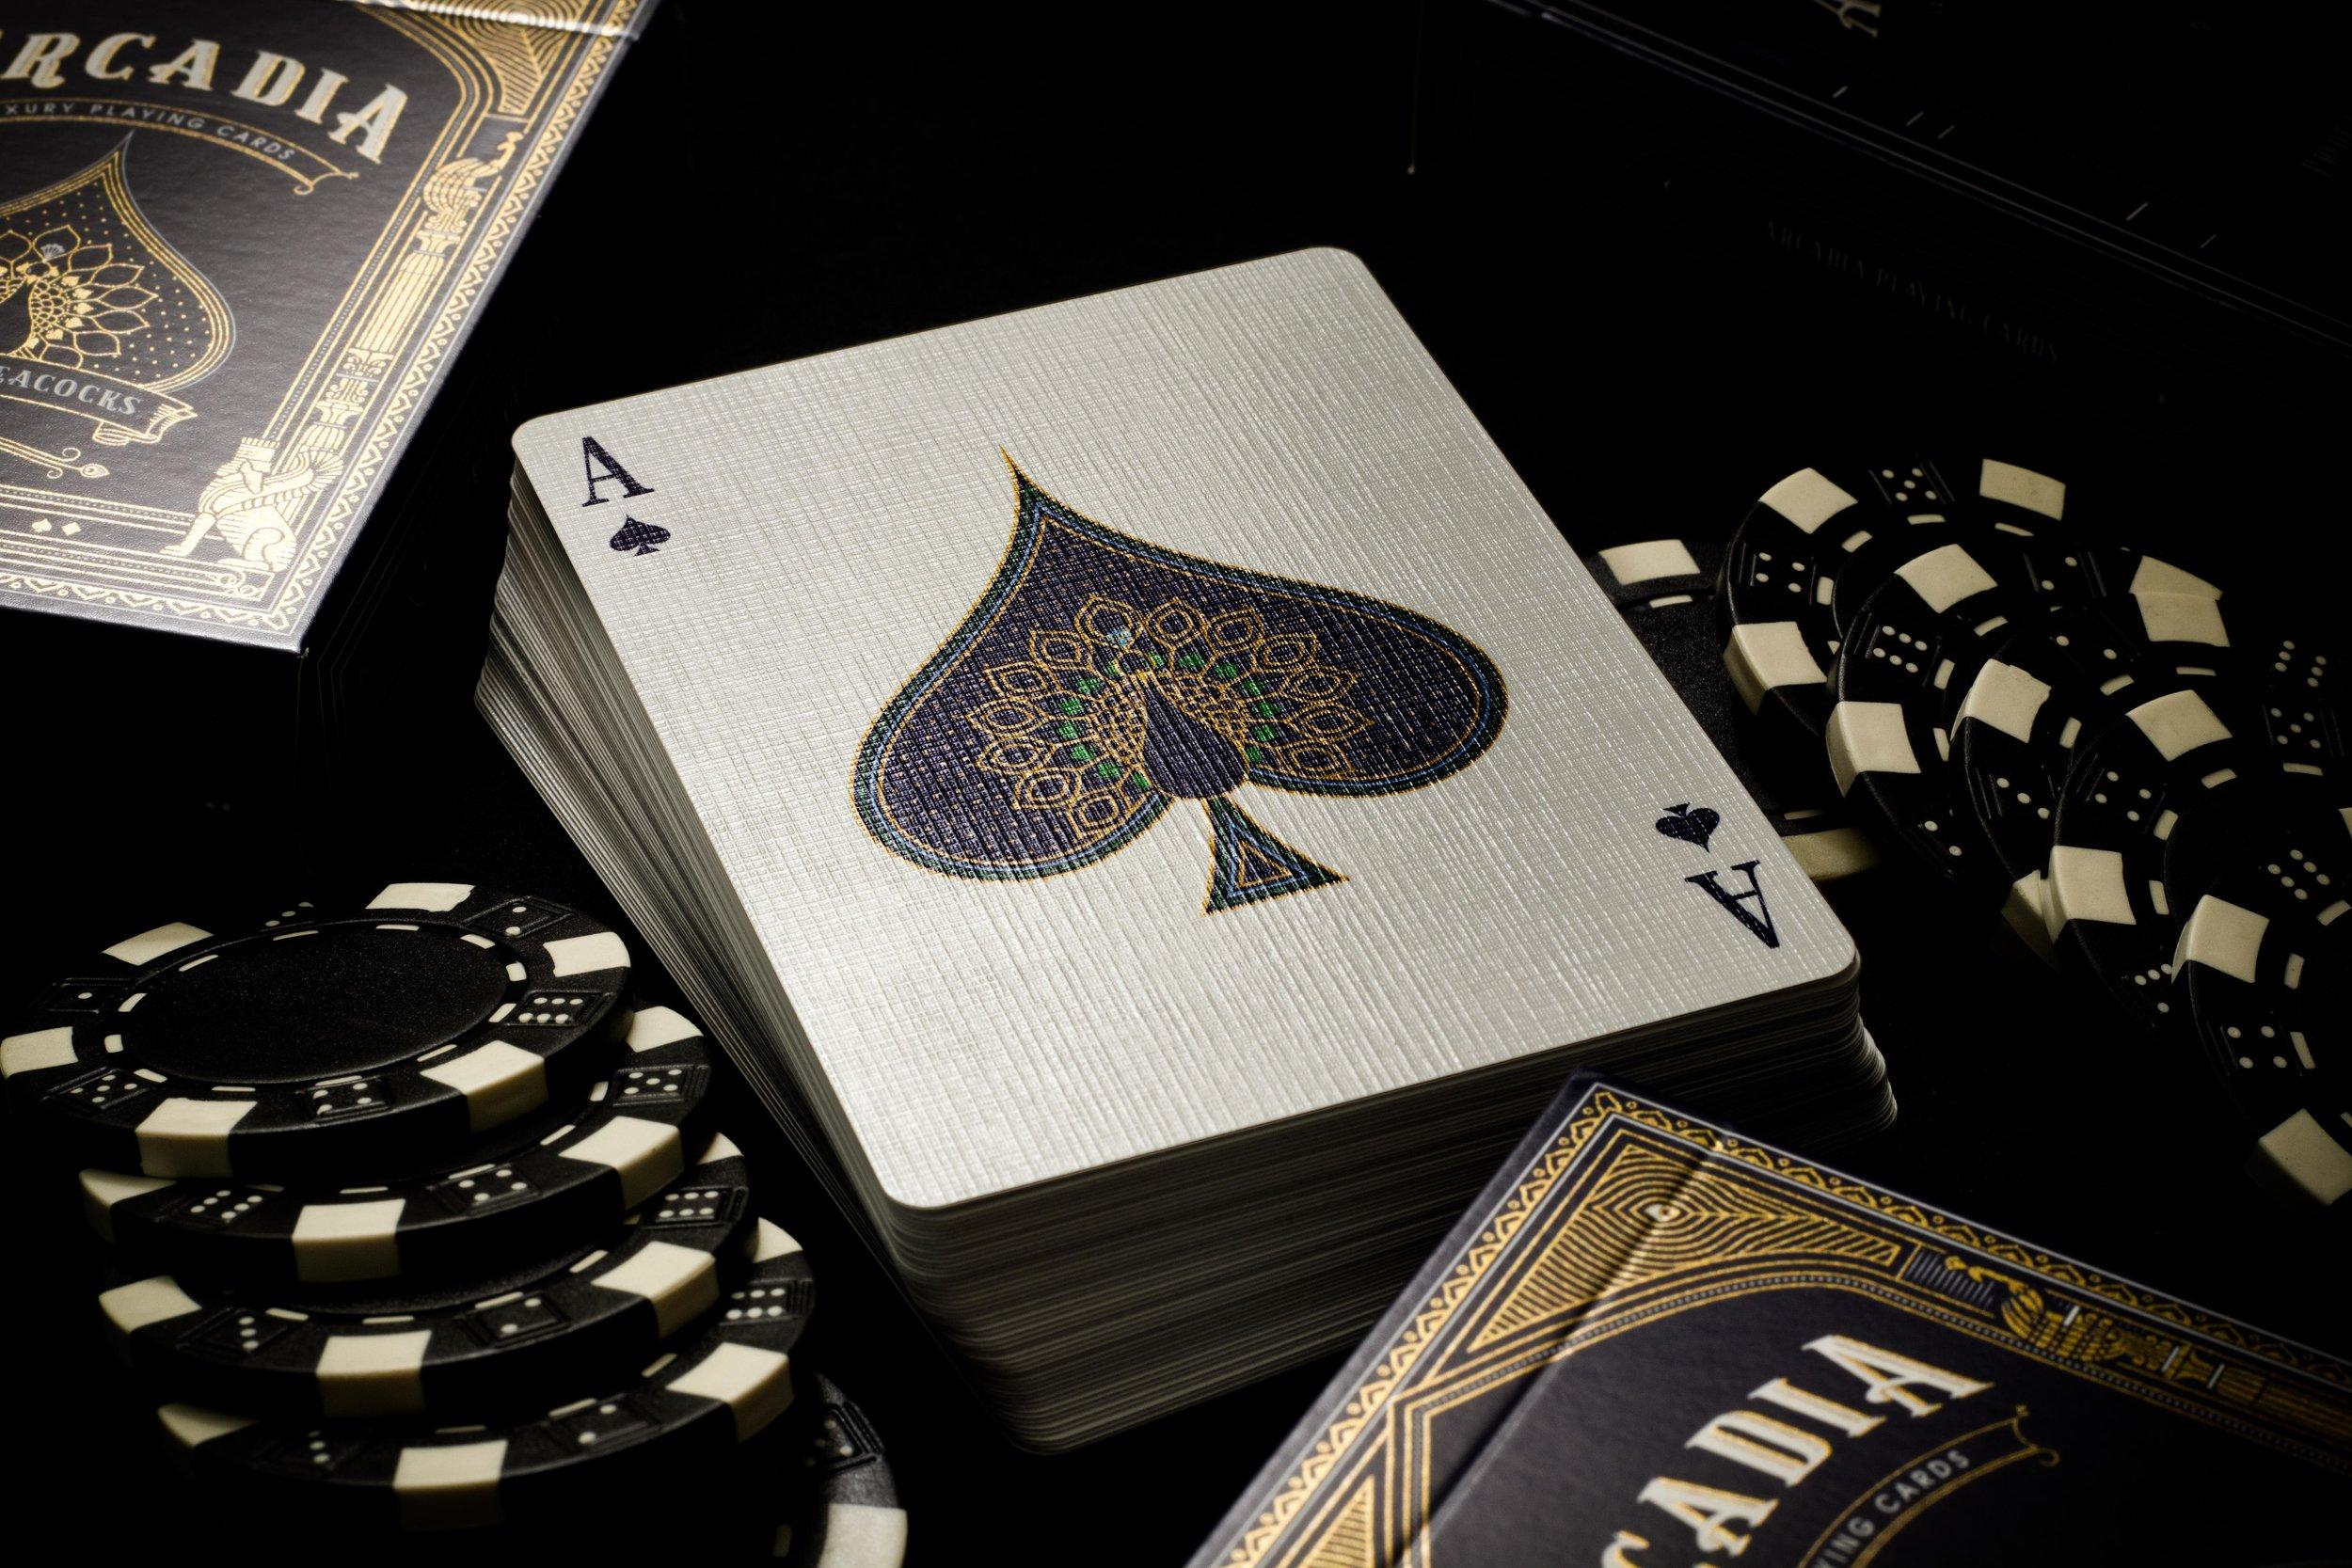 Pride of Peacock Deck by Arcadia Playing Cards 2.jpg